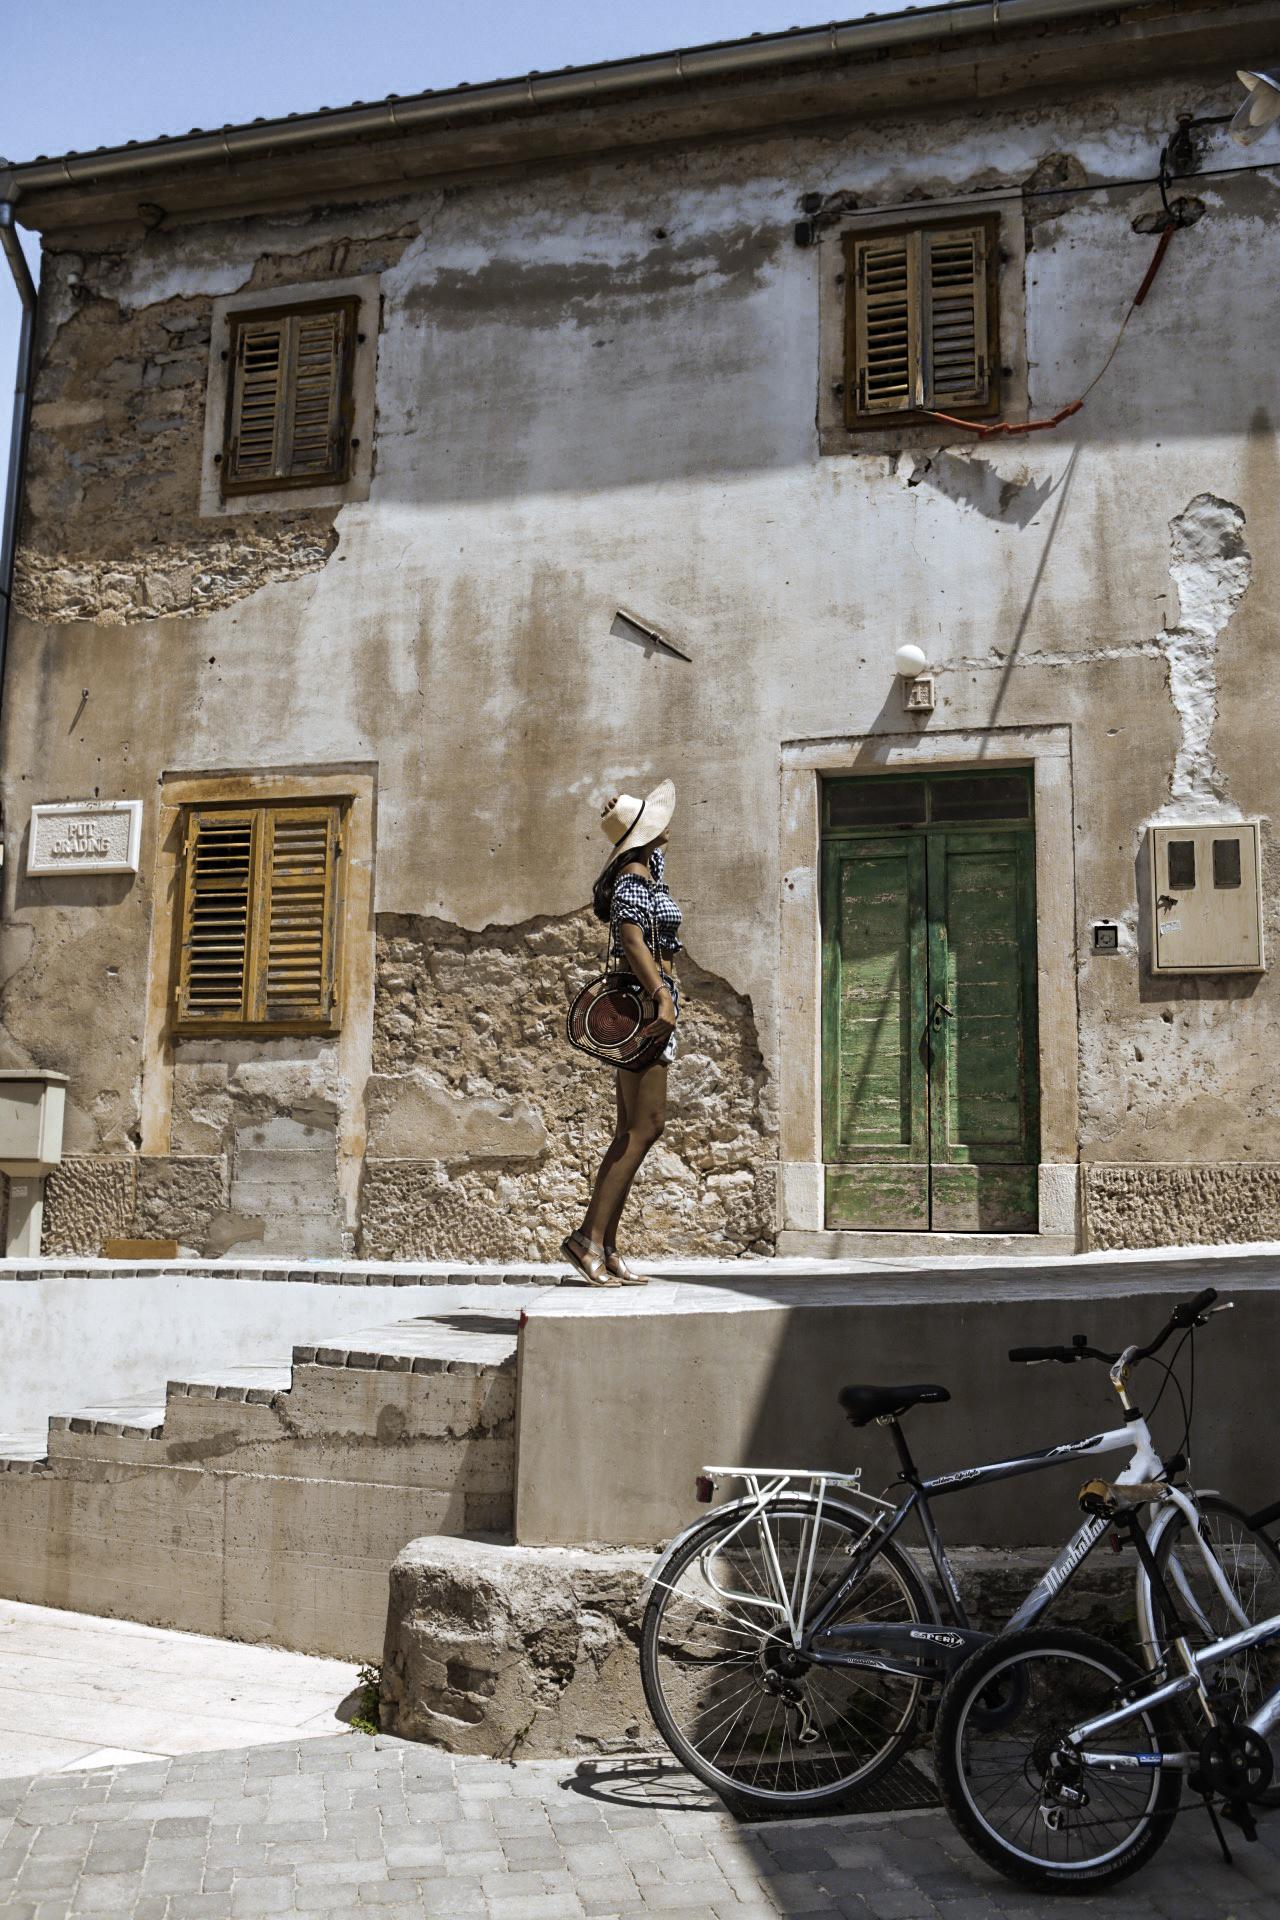 Wandering the Old Town in Skradin, Croatia - illumelation